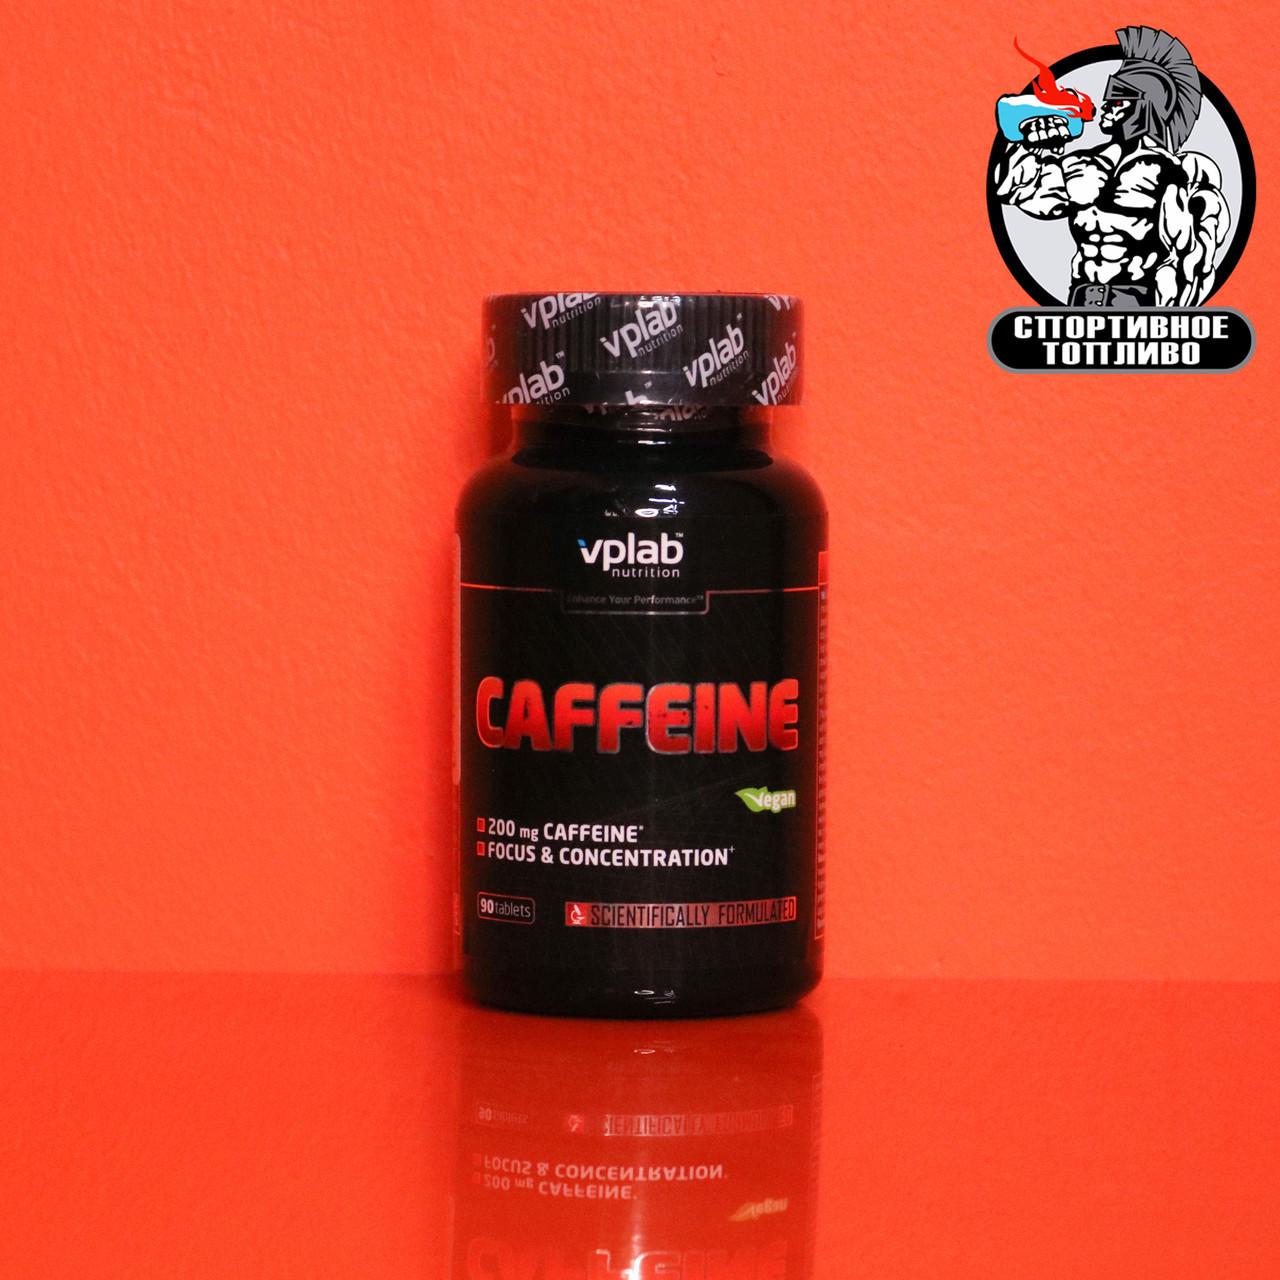 VPLab - Caffeine 100табл/100порций